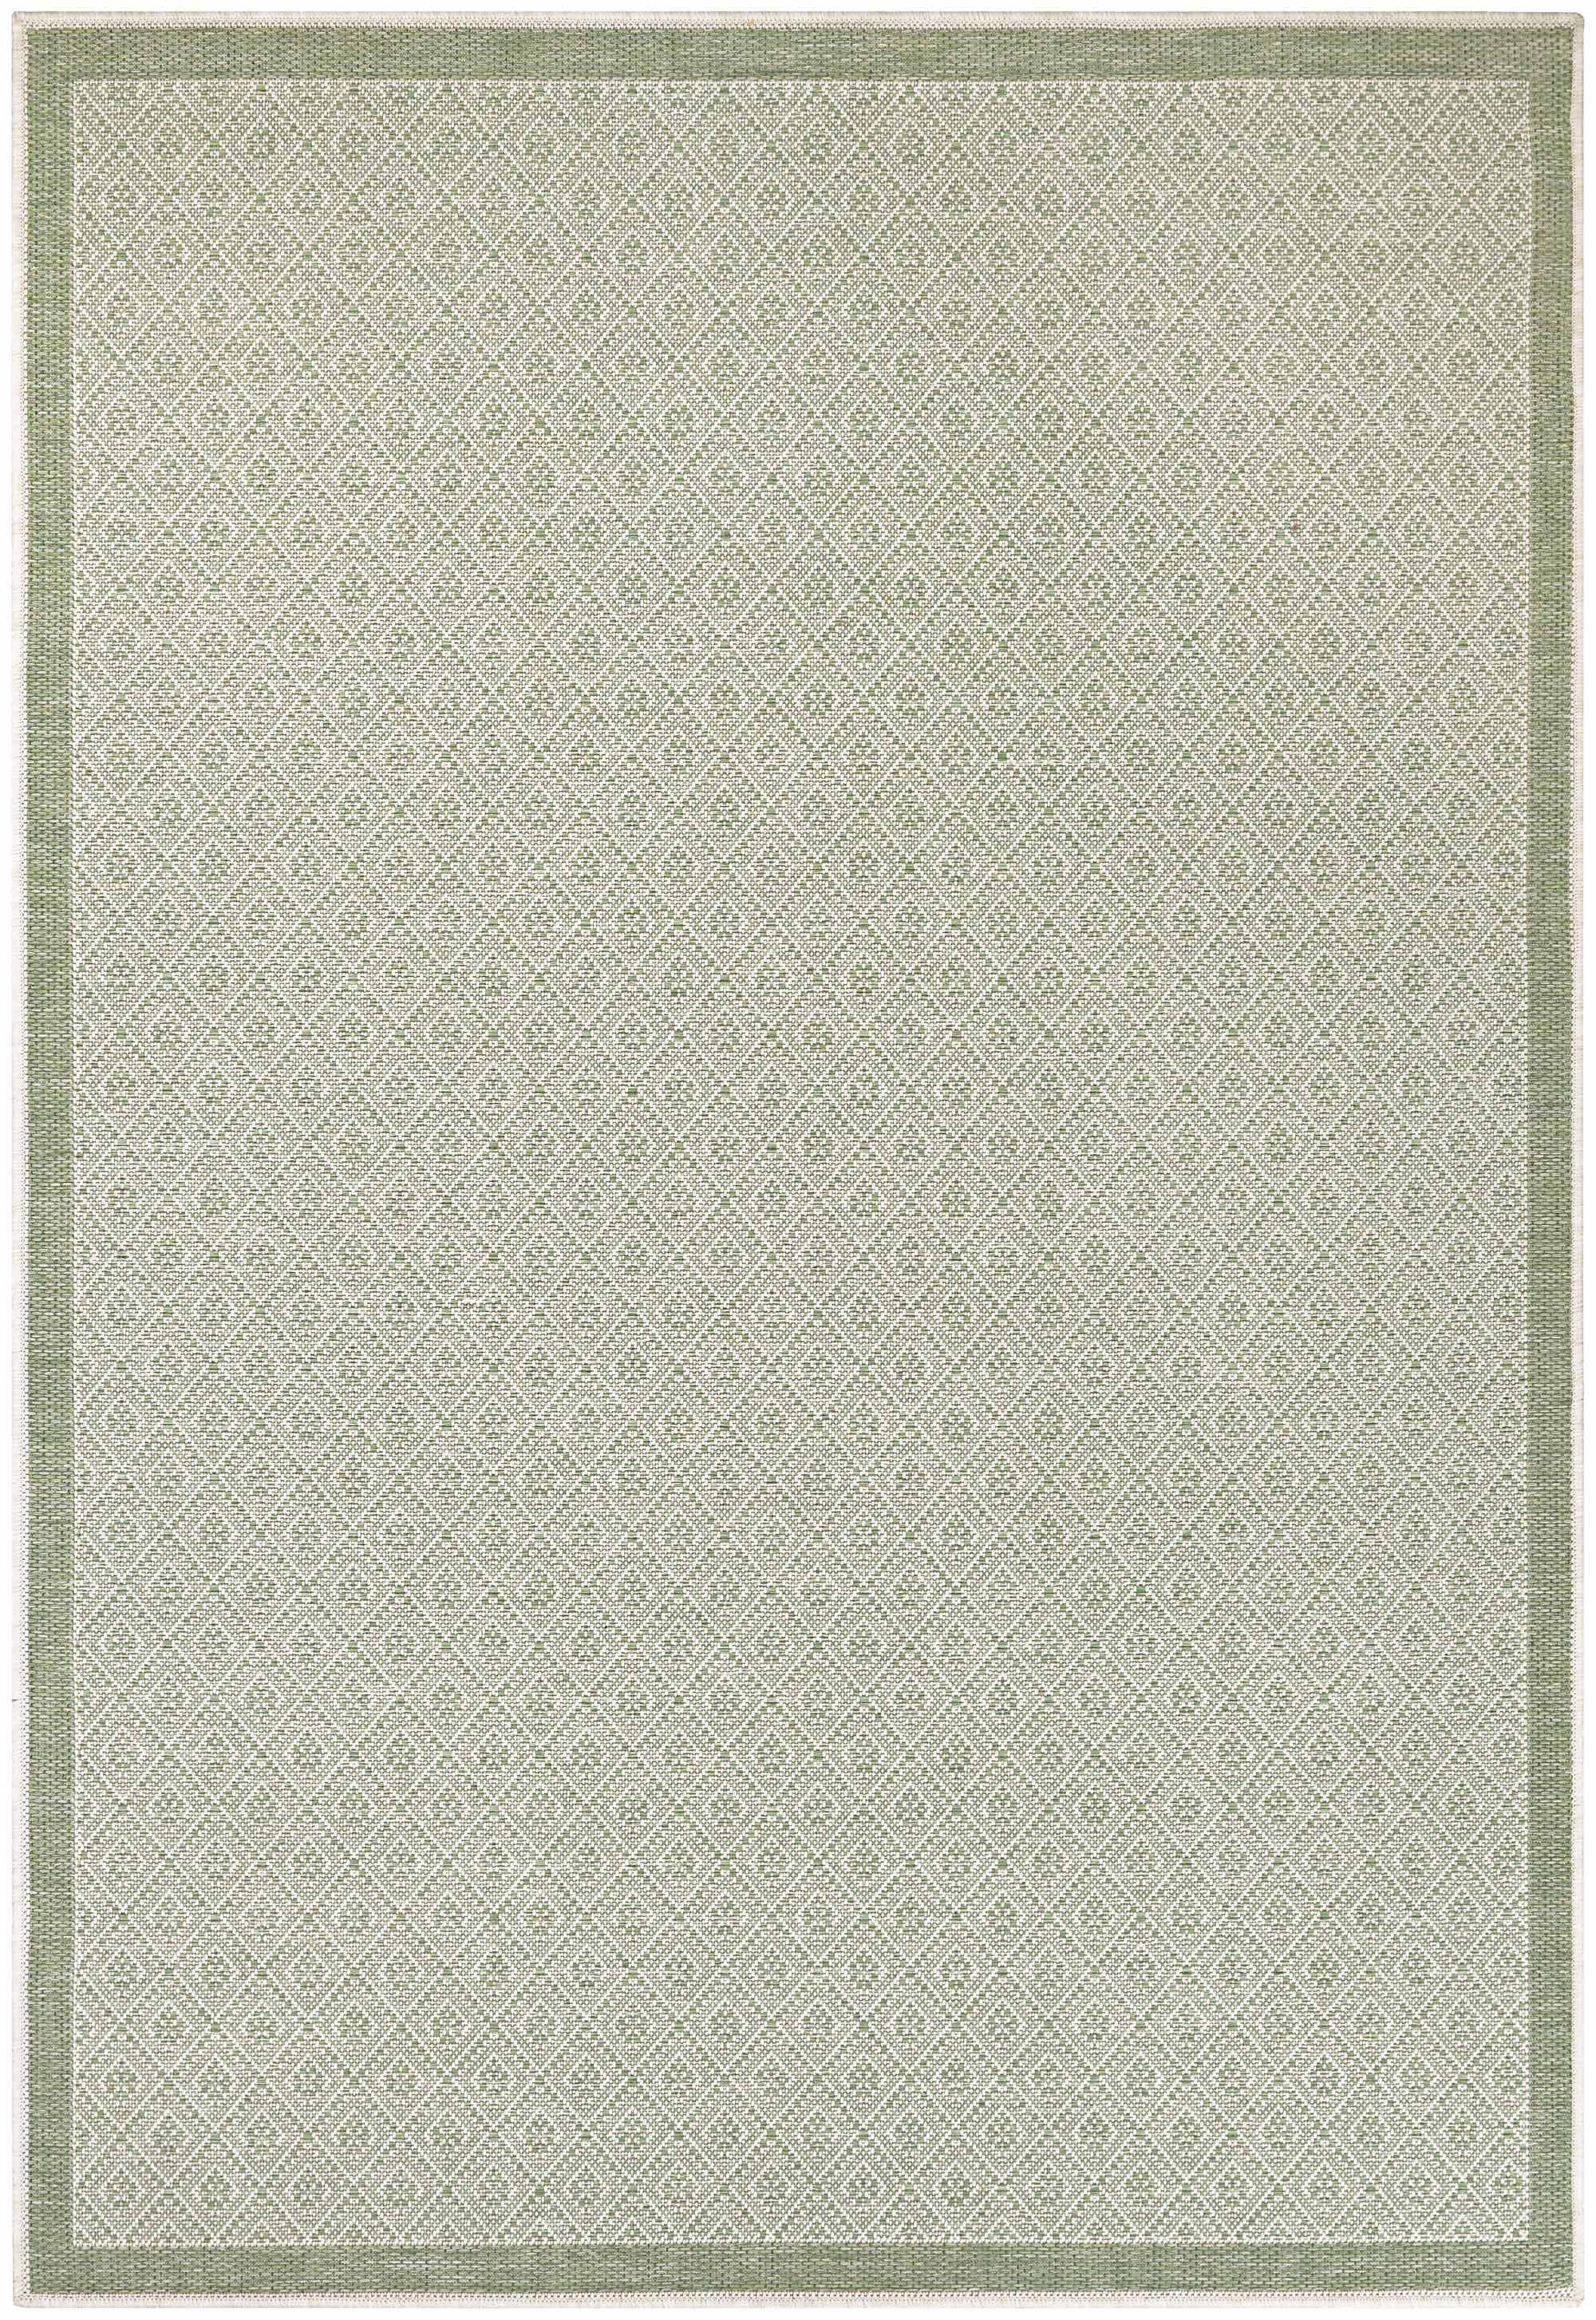 Wexford Sea Mist Indoor/Outdoor Area Rug Rug Size: Rectangle 8'6